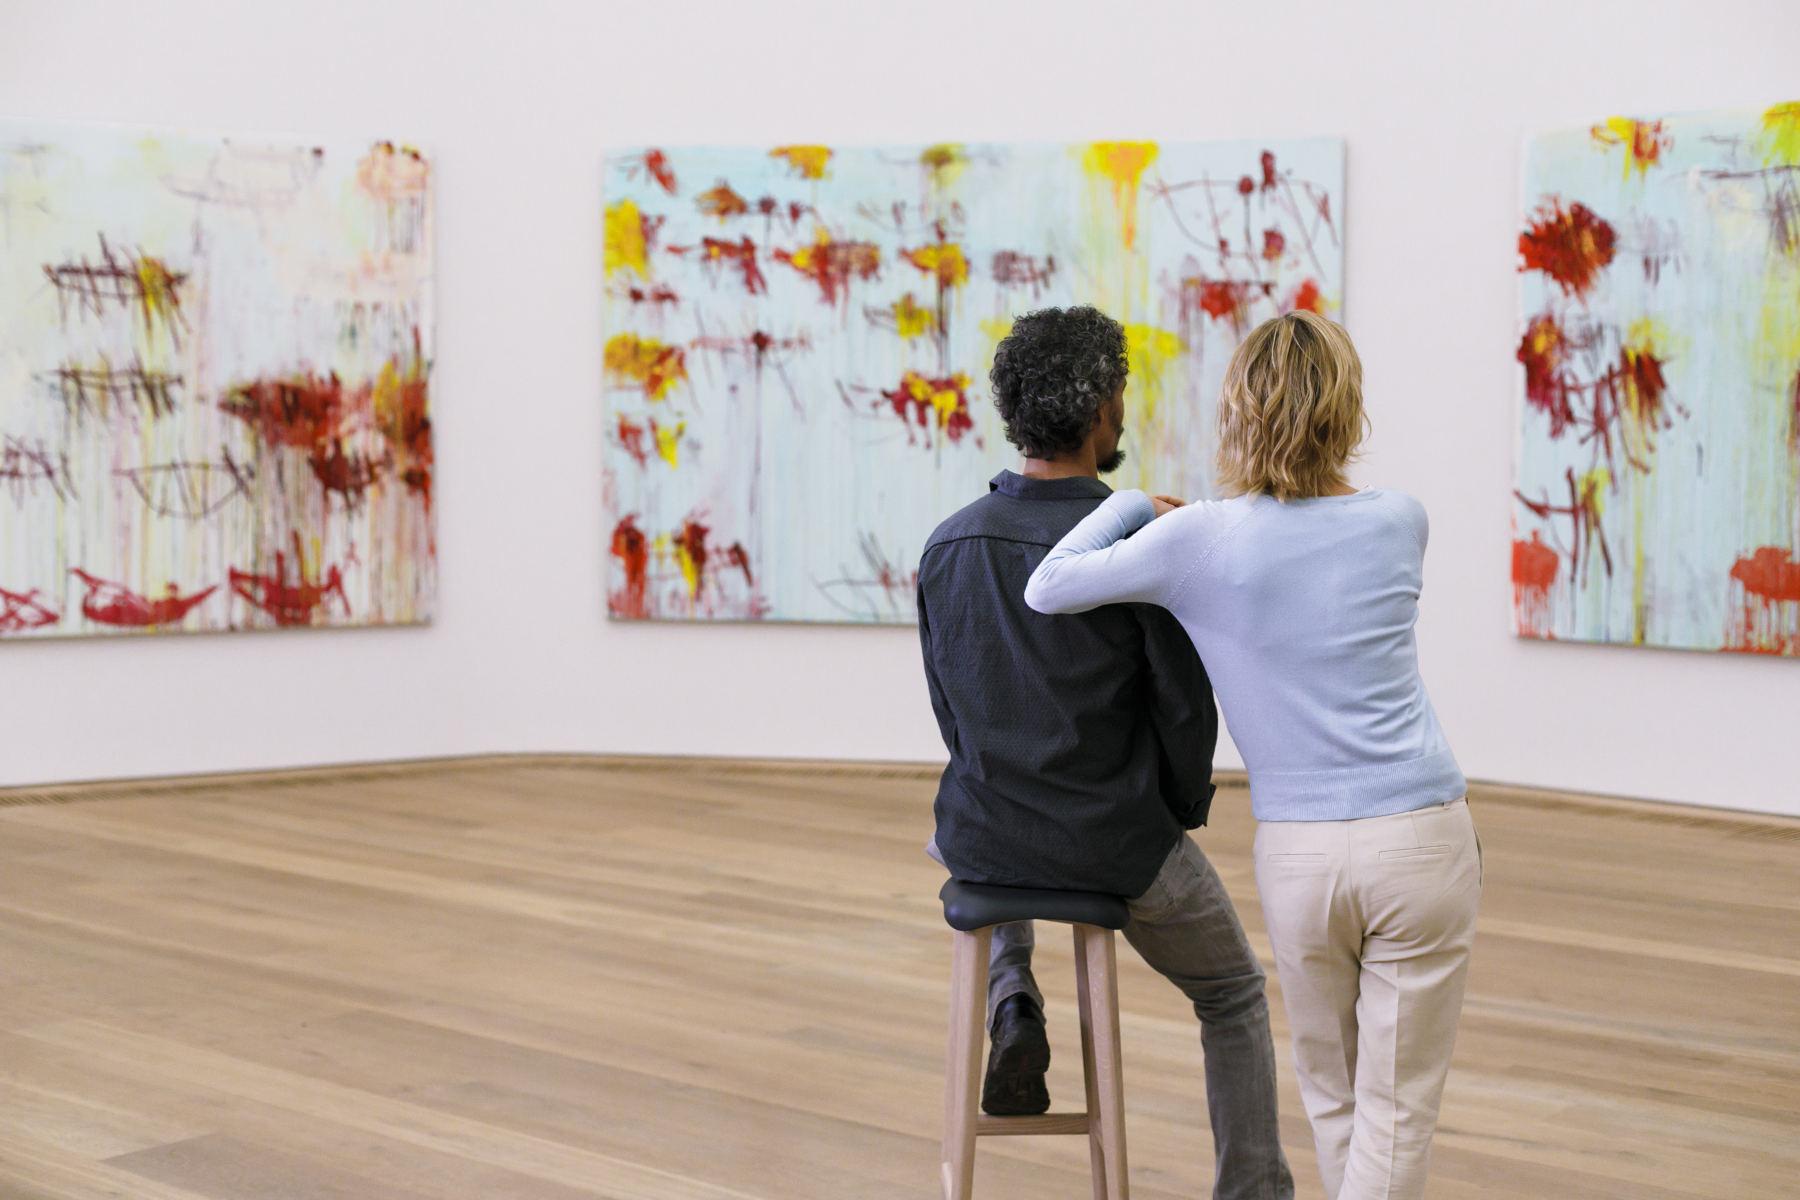 Muenchen Tourismus-Museum Brandhorst-Pinakothek der Moderne-Foto Christian Kasper-1712_96